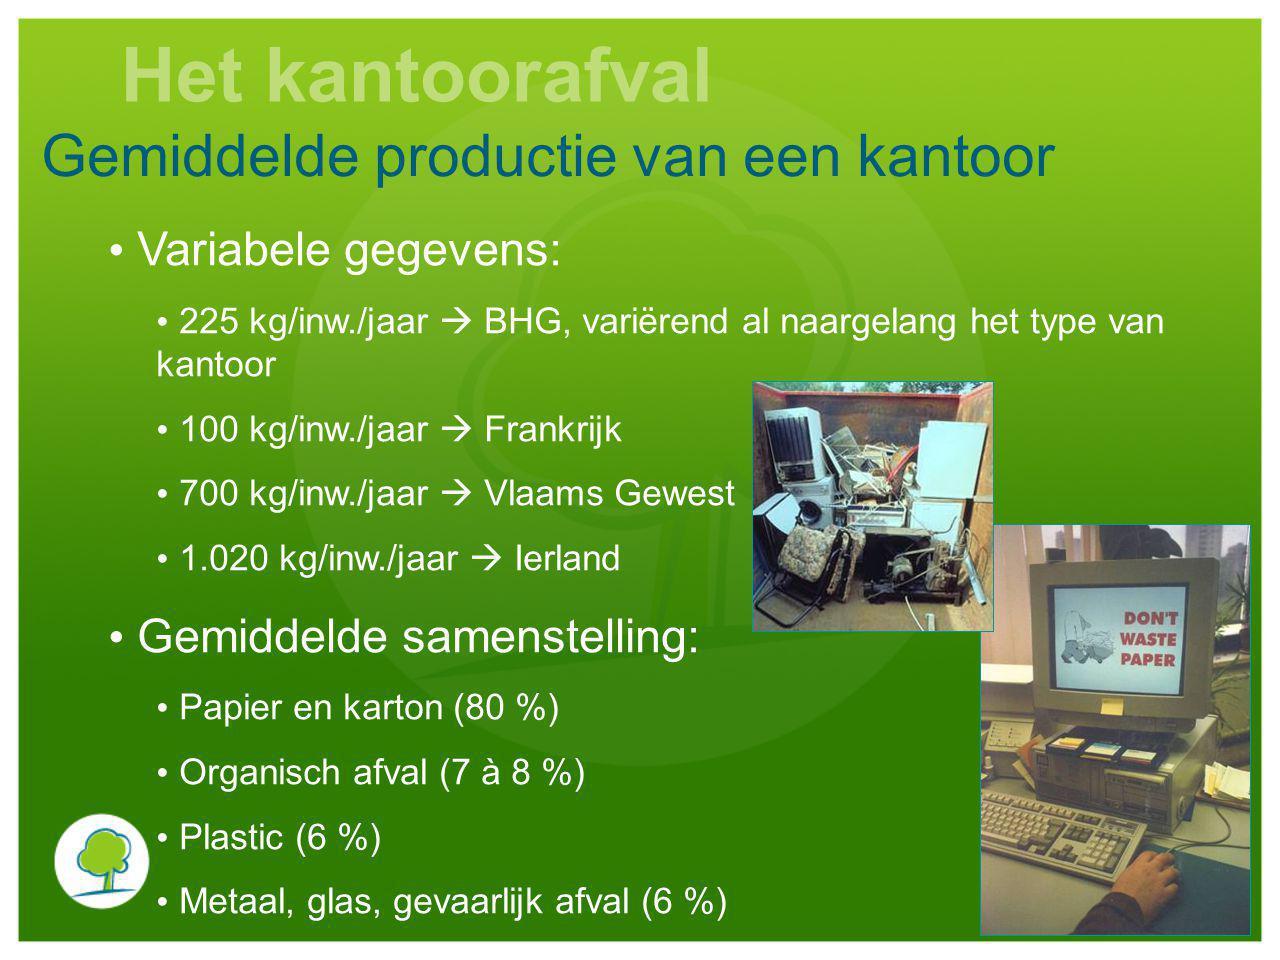 Gemiddelde productie van een kantoor Variabele gegevens: 225 kg/inw./jaar  BHG, variërend al naargelang het type van kantoor 100 kg/inw./jaar  Frank